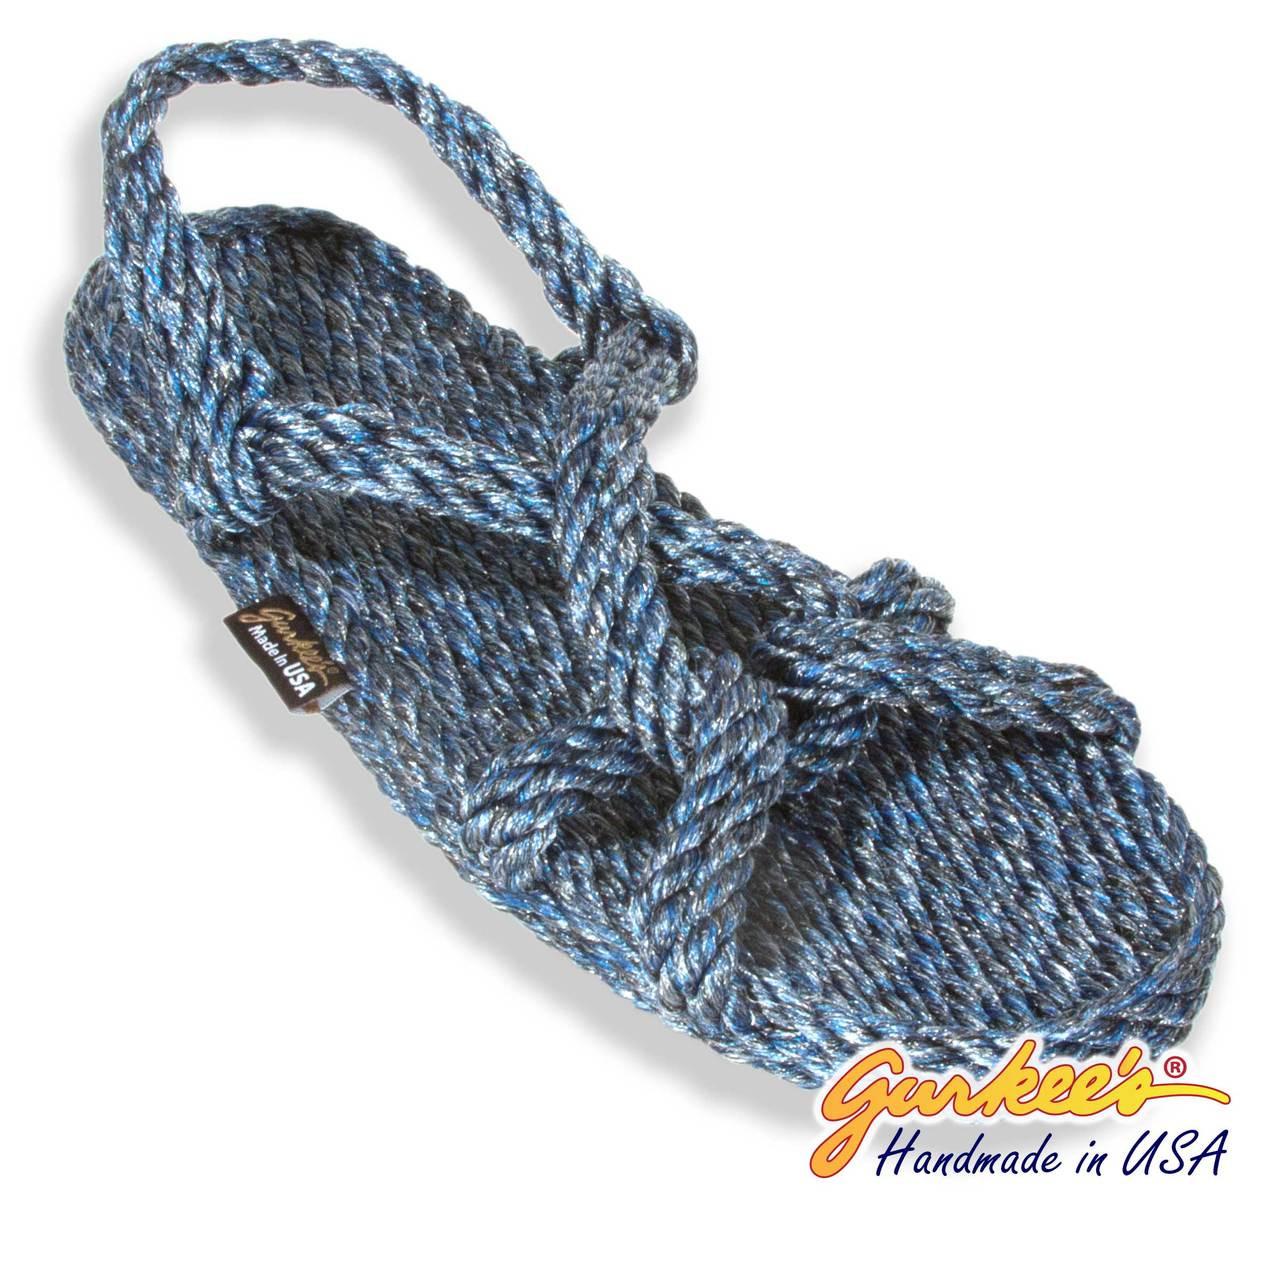 eabbdbfbc93c ... Signature Barbados Blue Ice Rope Sandals. Loading zoom